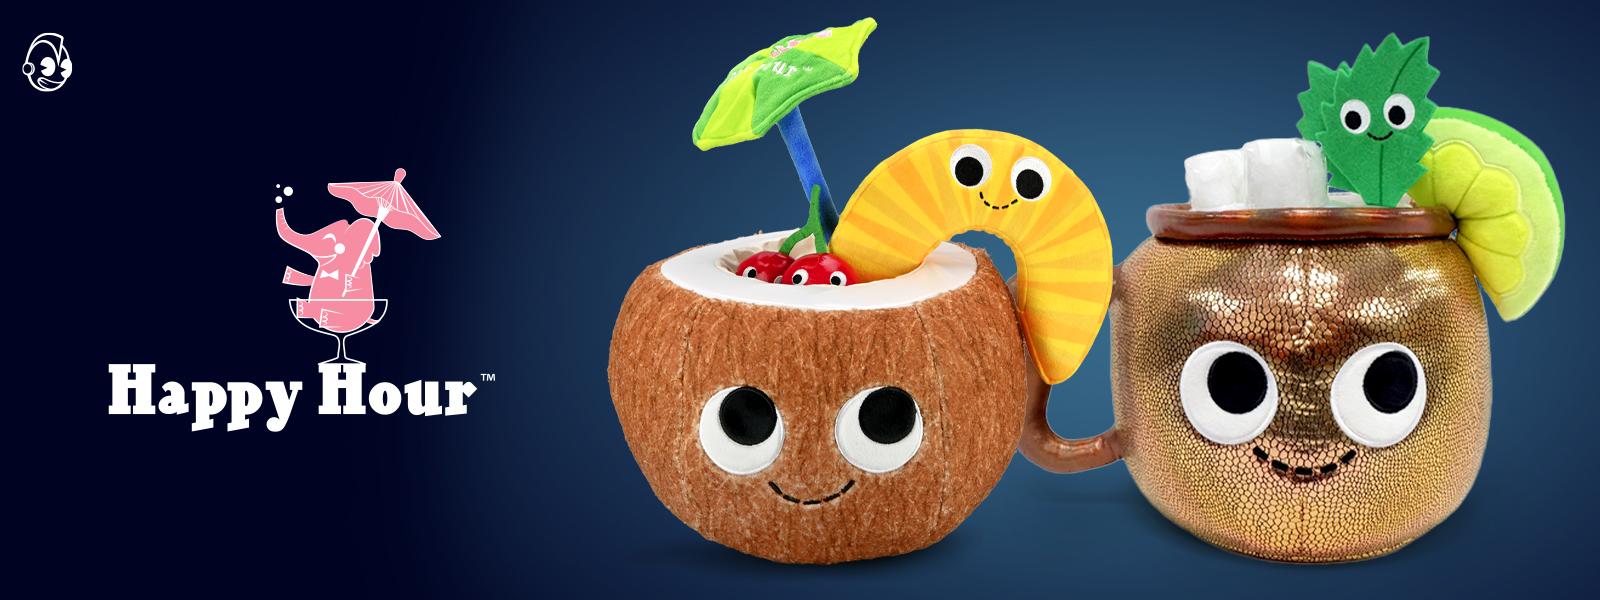 Happy Hour Plush by Kidrobot